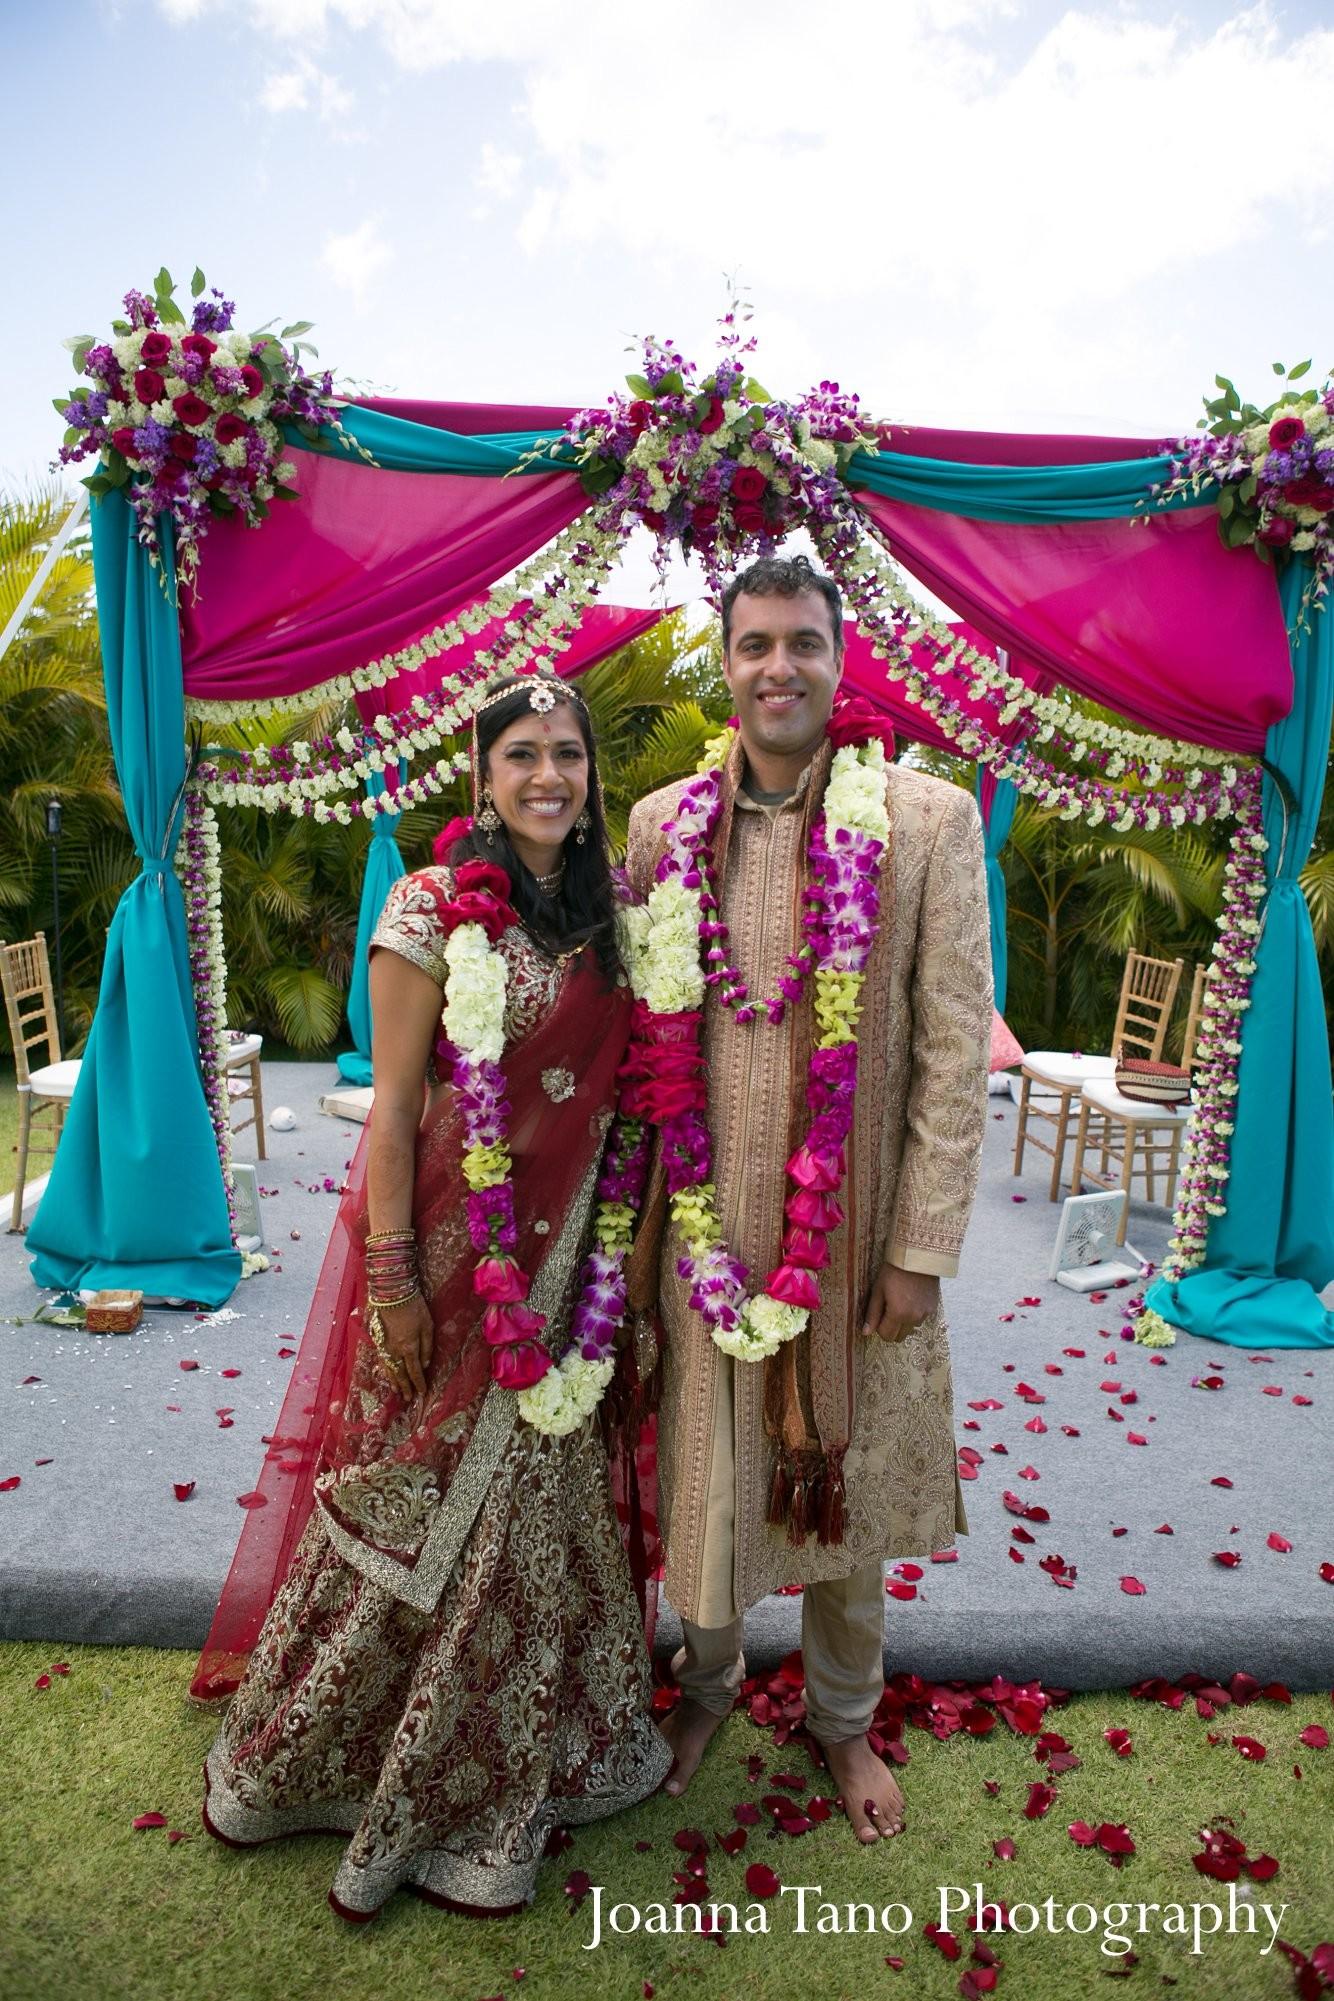 Maharani weddings dellables dellables wedding design florals maharani weddings dellables junglespirit Image collections